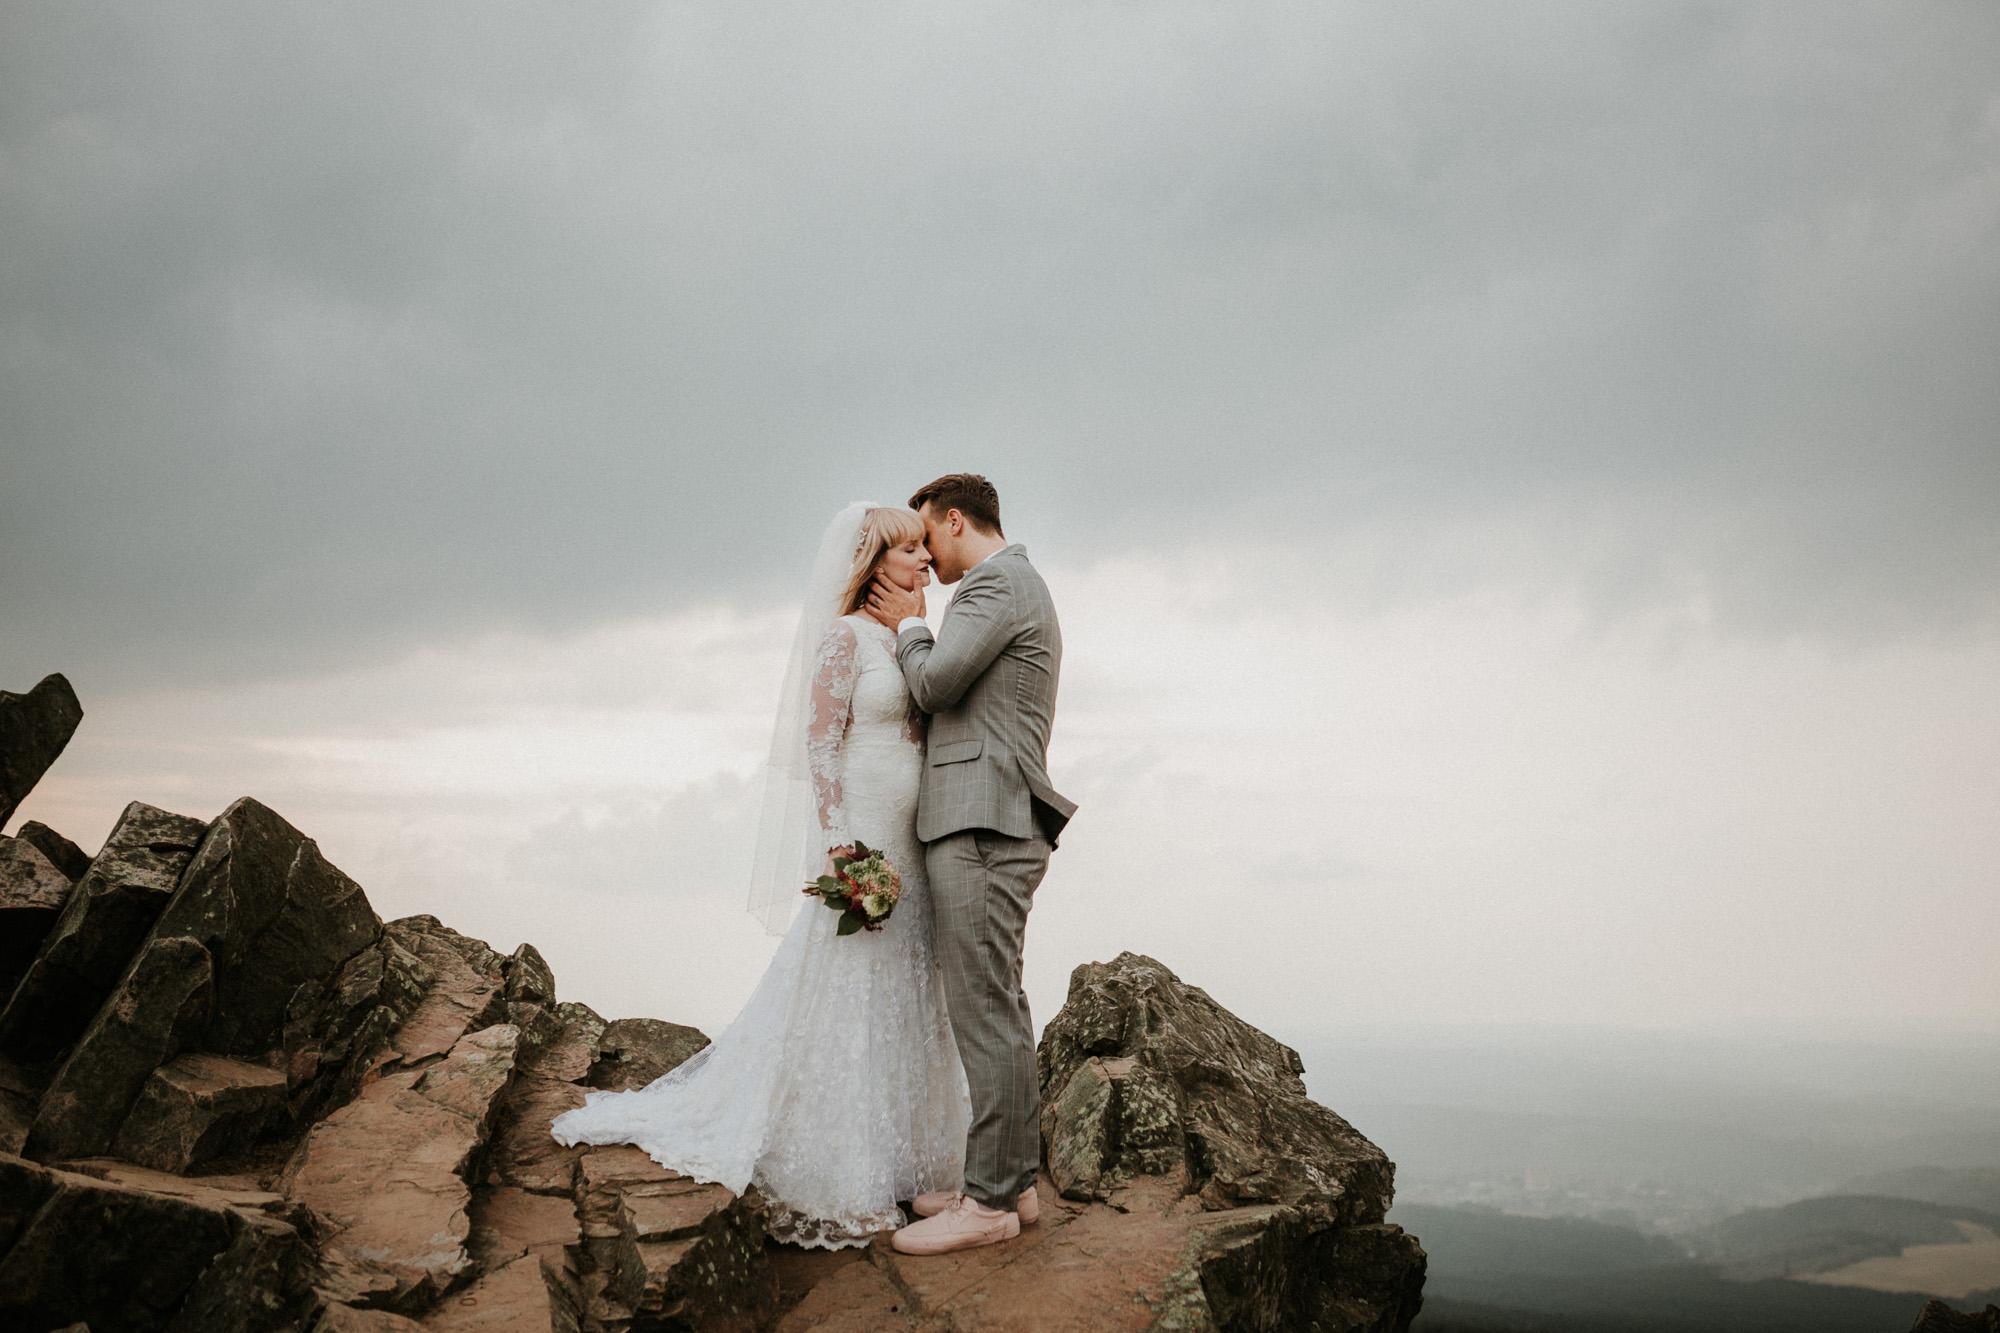 DanielaMarquardtPhotography_Hochzeitsfotograf_Düsseldorf_Köln_Mallorca_Bayern_Austria_Harz_LinaundMaik_Afterwedding-Shooting_Weddingphotographer_Ibiza_Tuskany_Italien_Toskana10